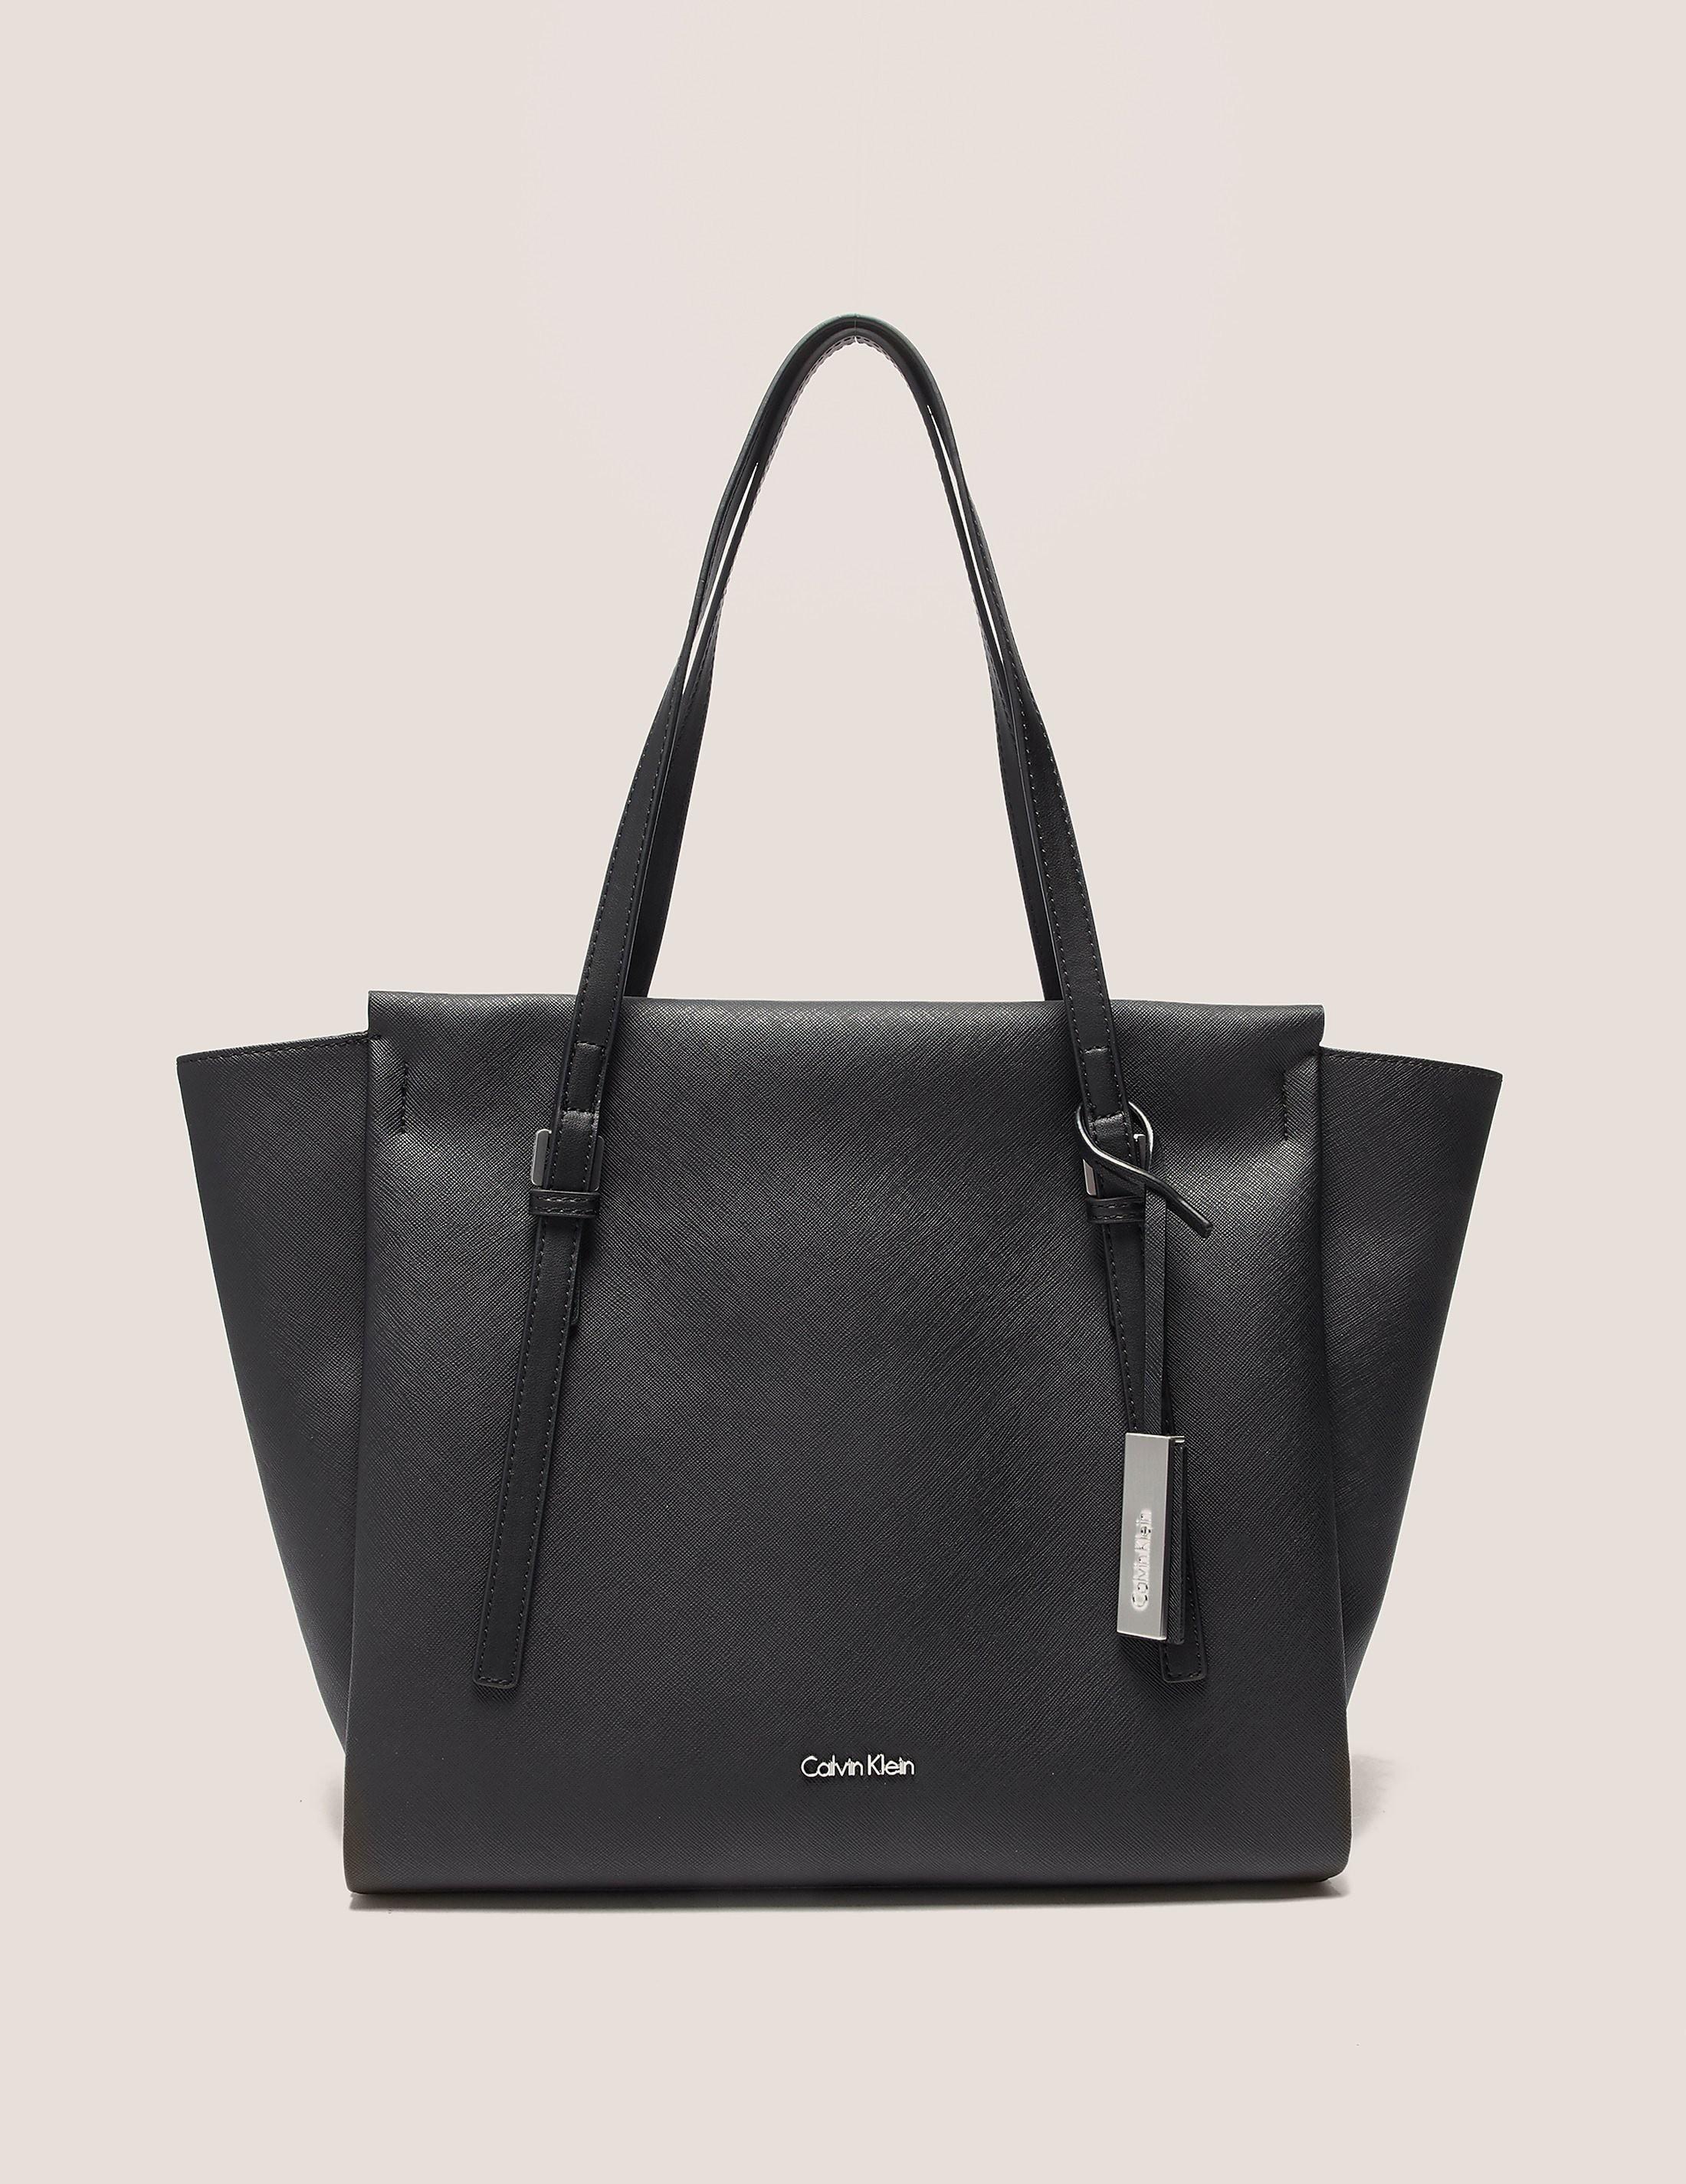 Calvin Klein Marissa Tote Bag